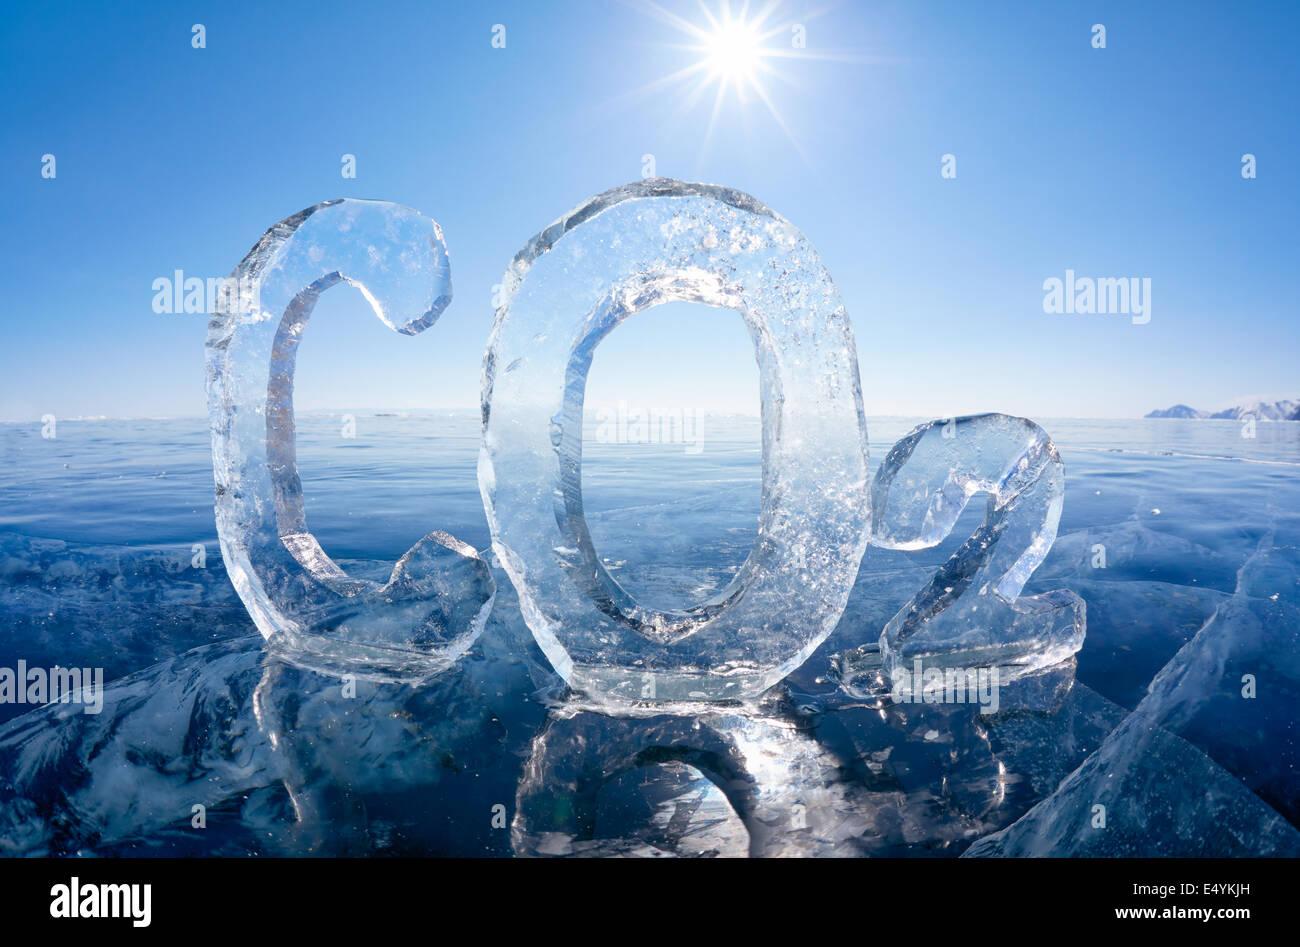 La fórmula química de hielo de dióxido de carbono (CO2) Imagen De Stock